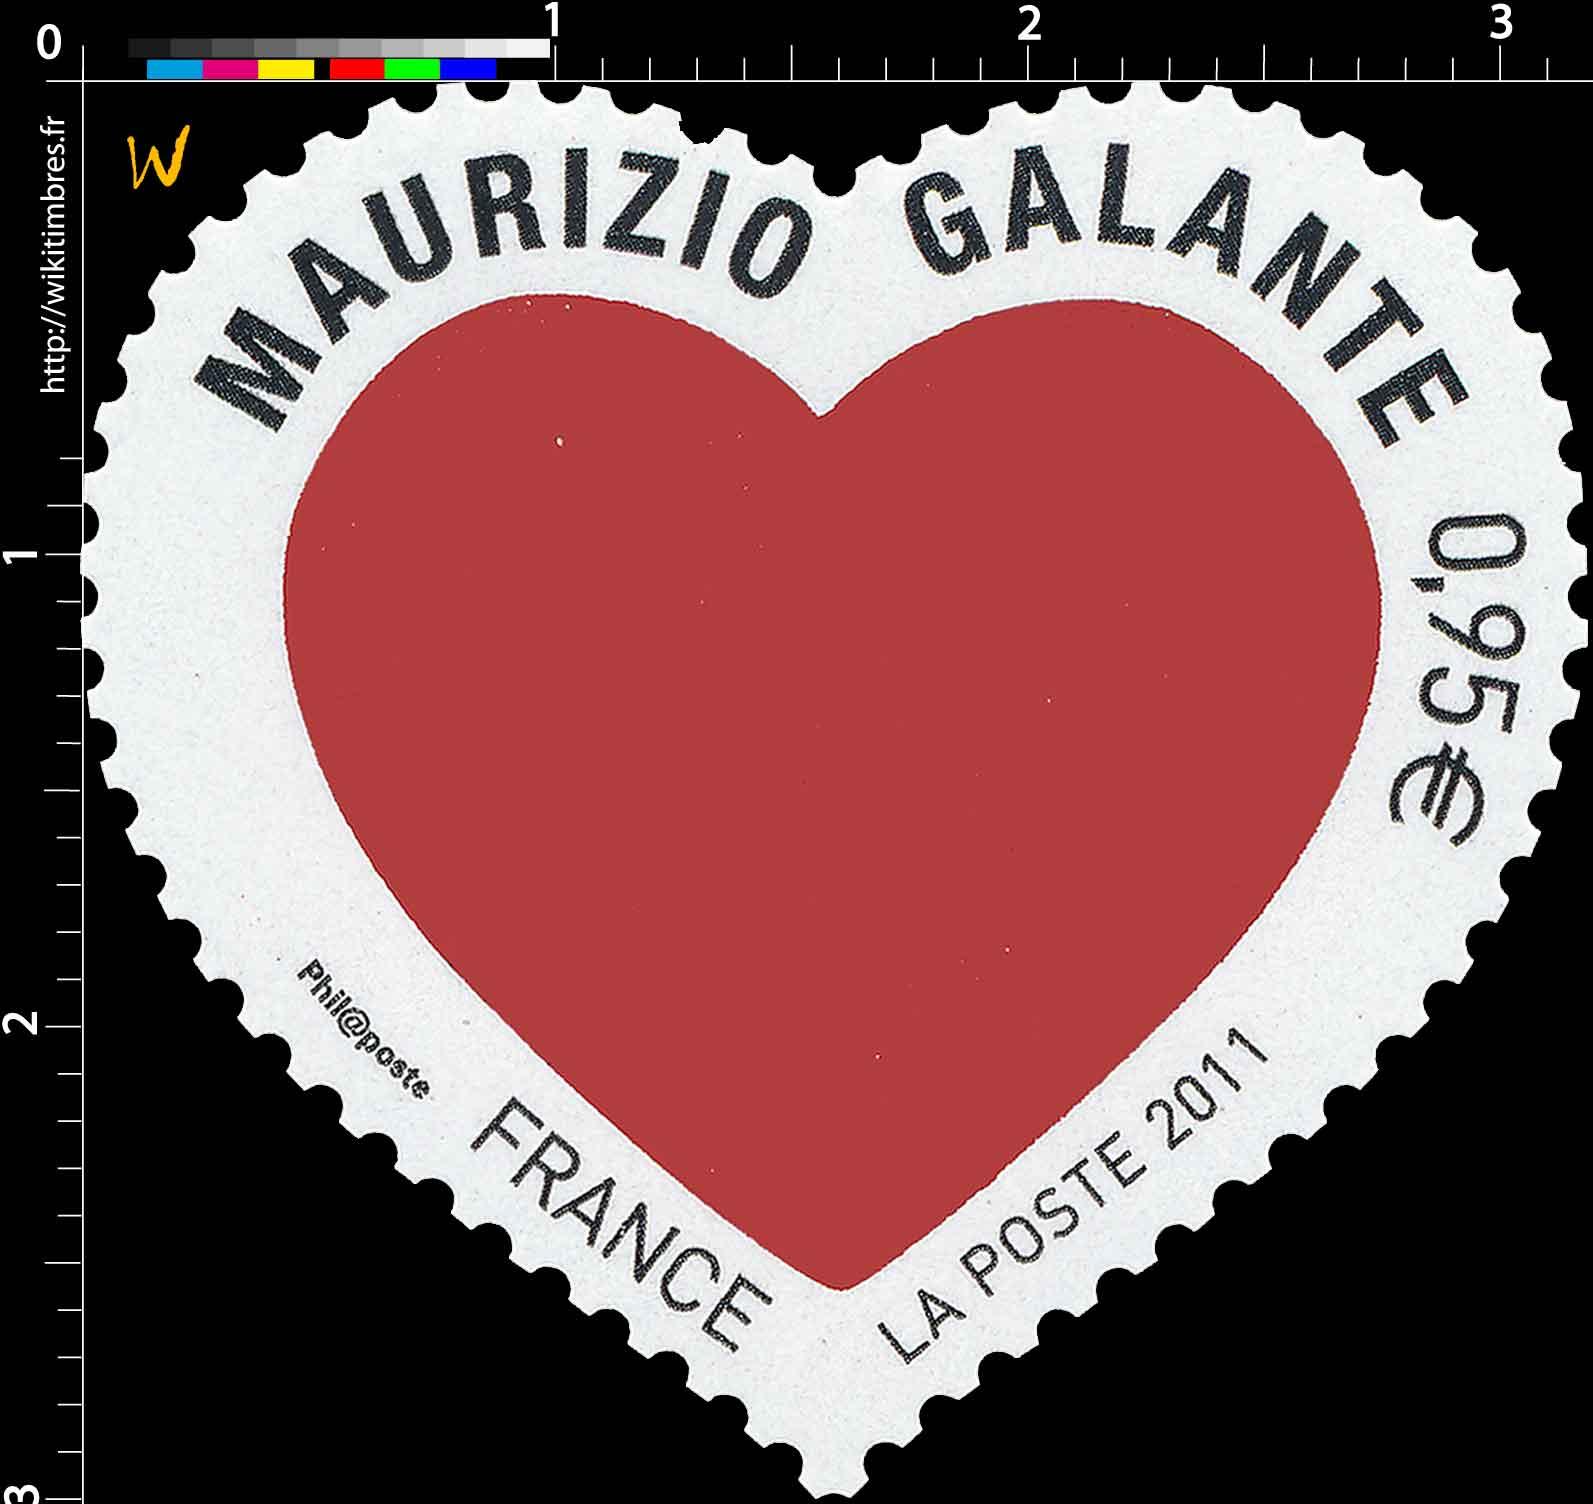 2011 Maurizio Galante